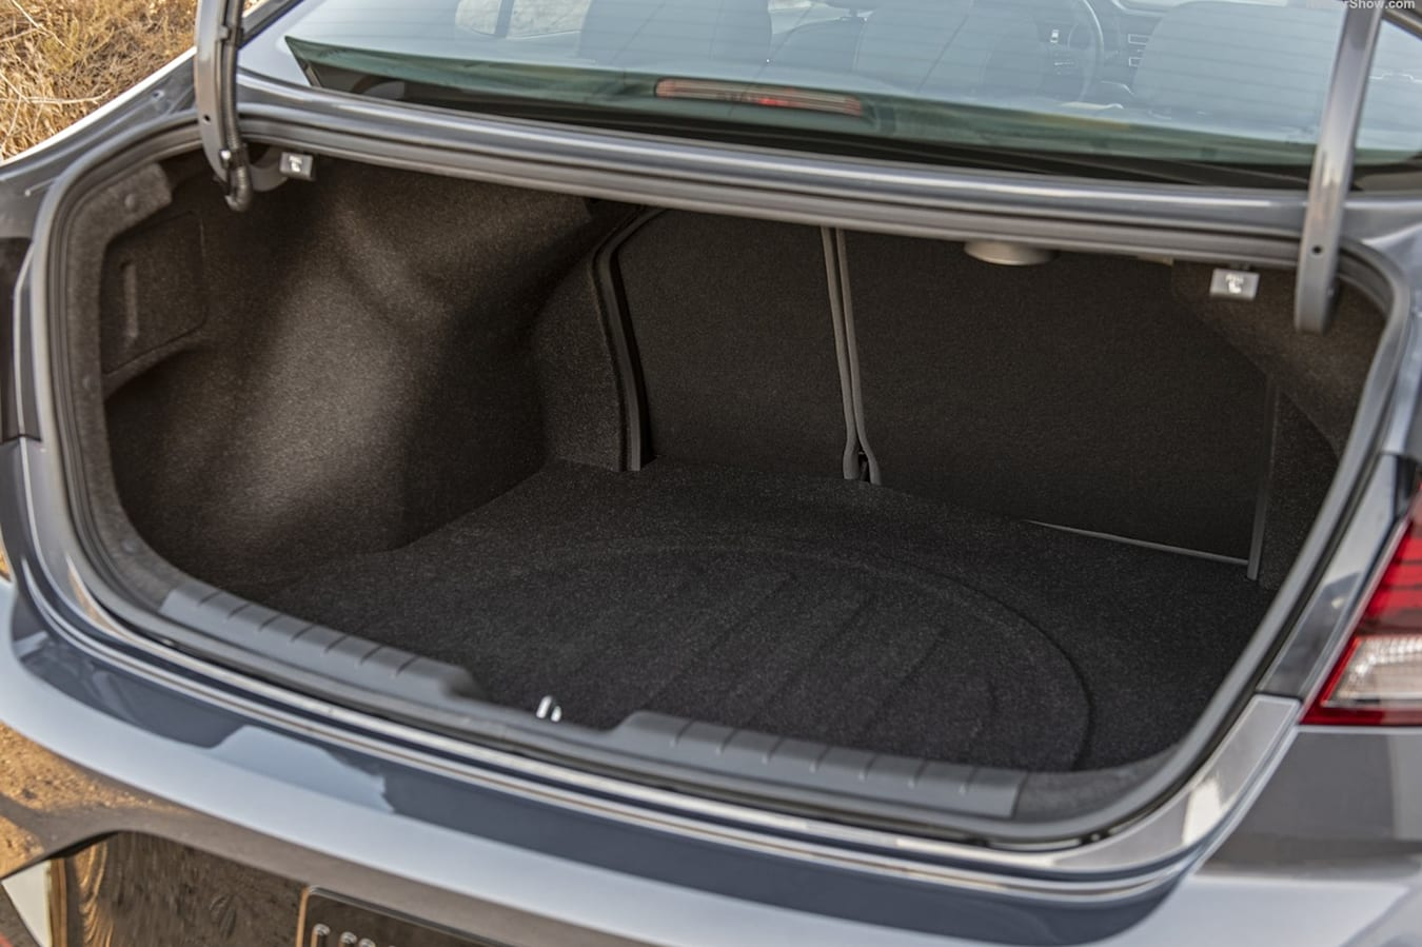 Hyundai Elantra boot